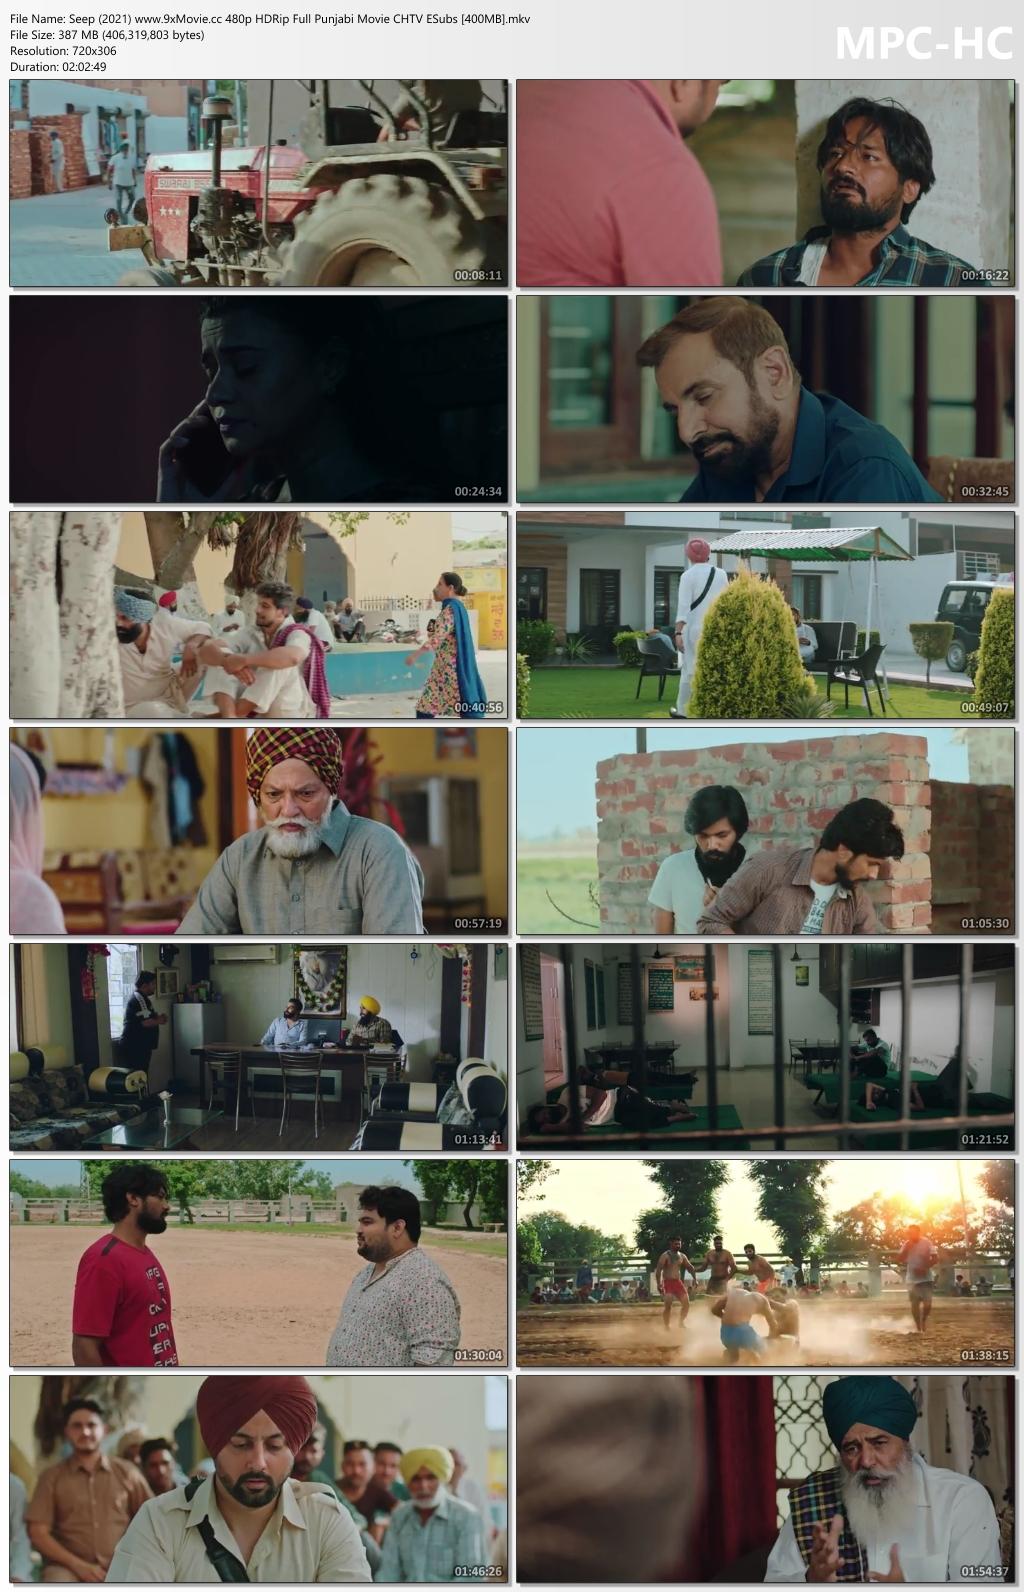 Seep-2021-www-9x-Movie-cc-480p-HDRip-Full-Punjabi-Movie-CHTV-ESubs-400-MB-mkv